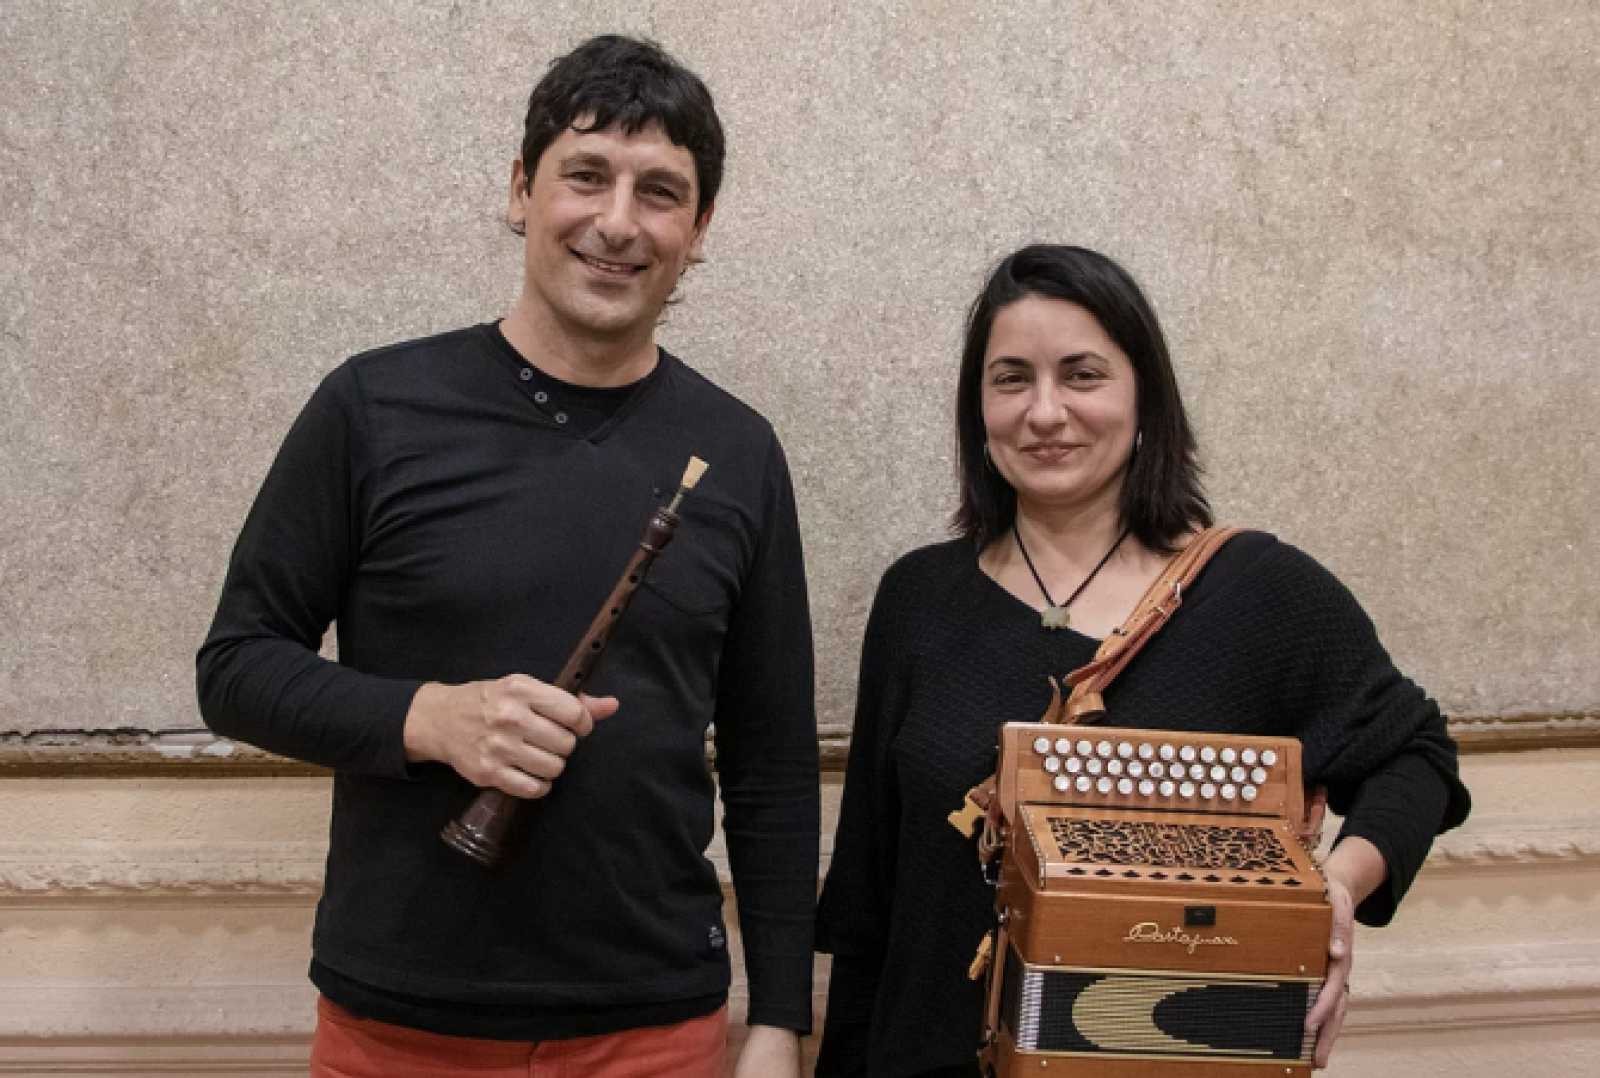 Tradicionàrius - Tretze vares amb Cati Plana i Pau Puig